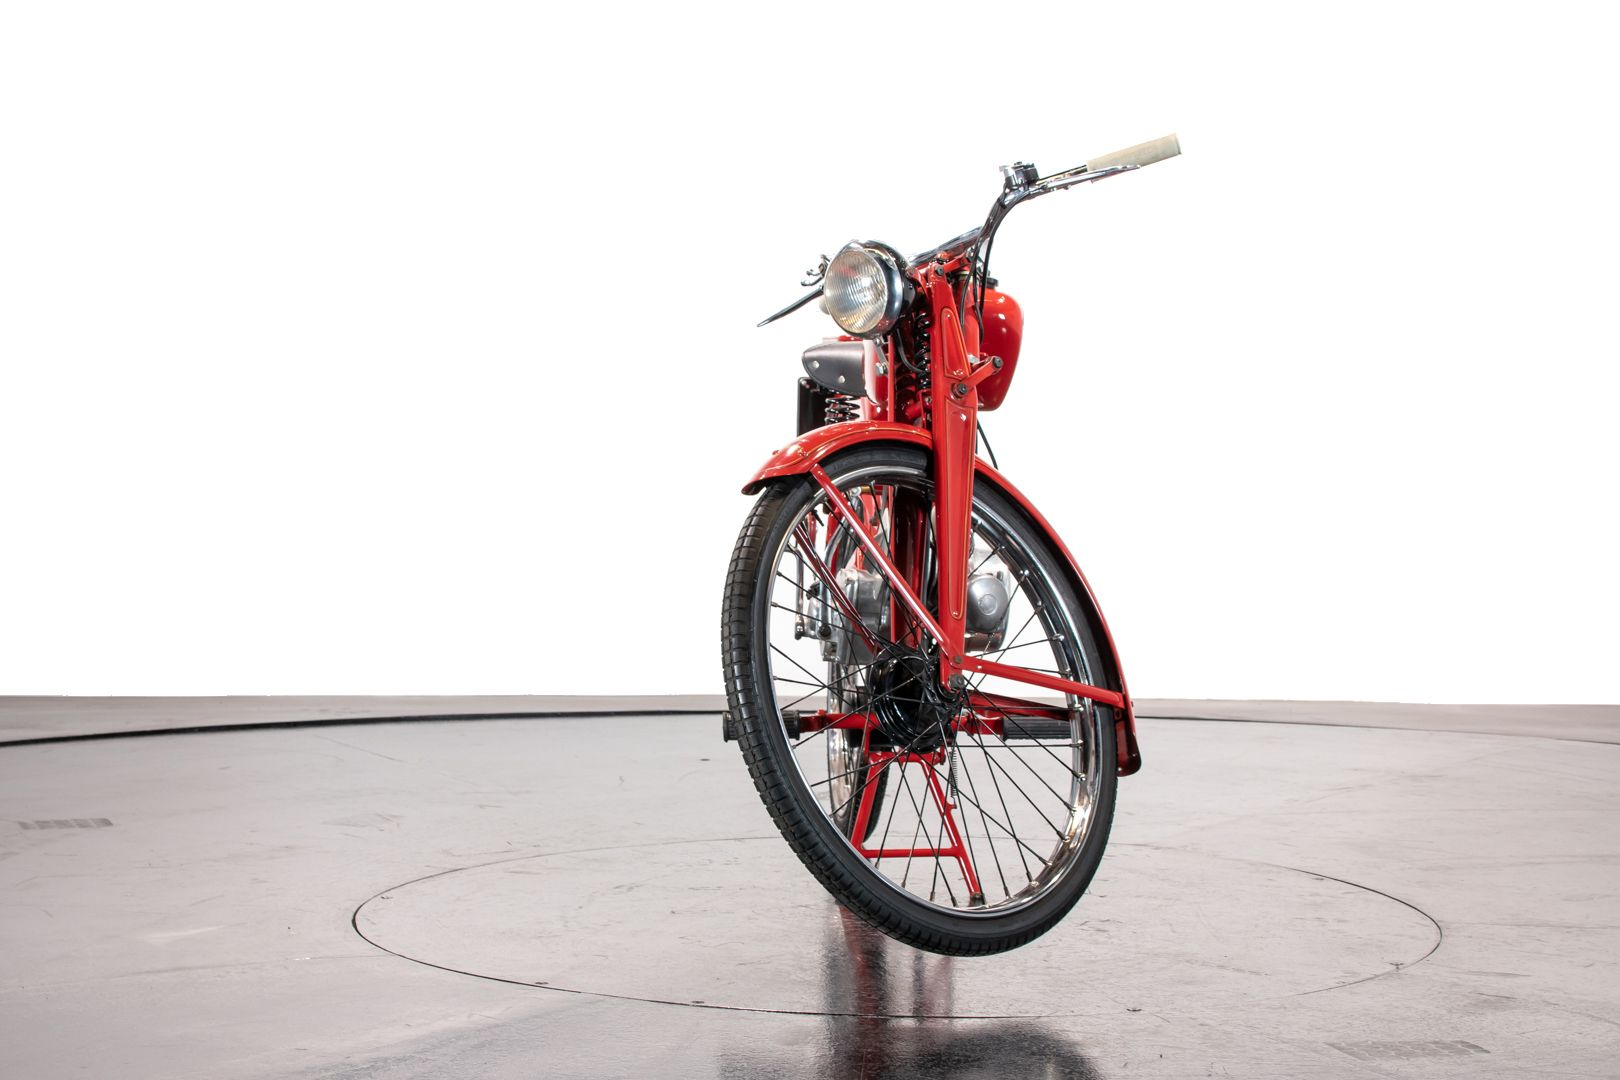 1952 Moto Guzzi 65 59384